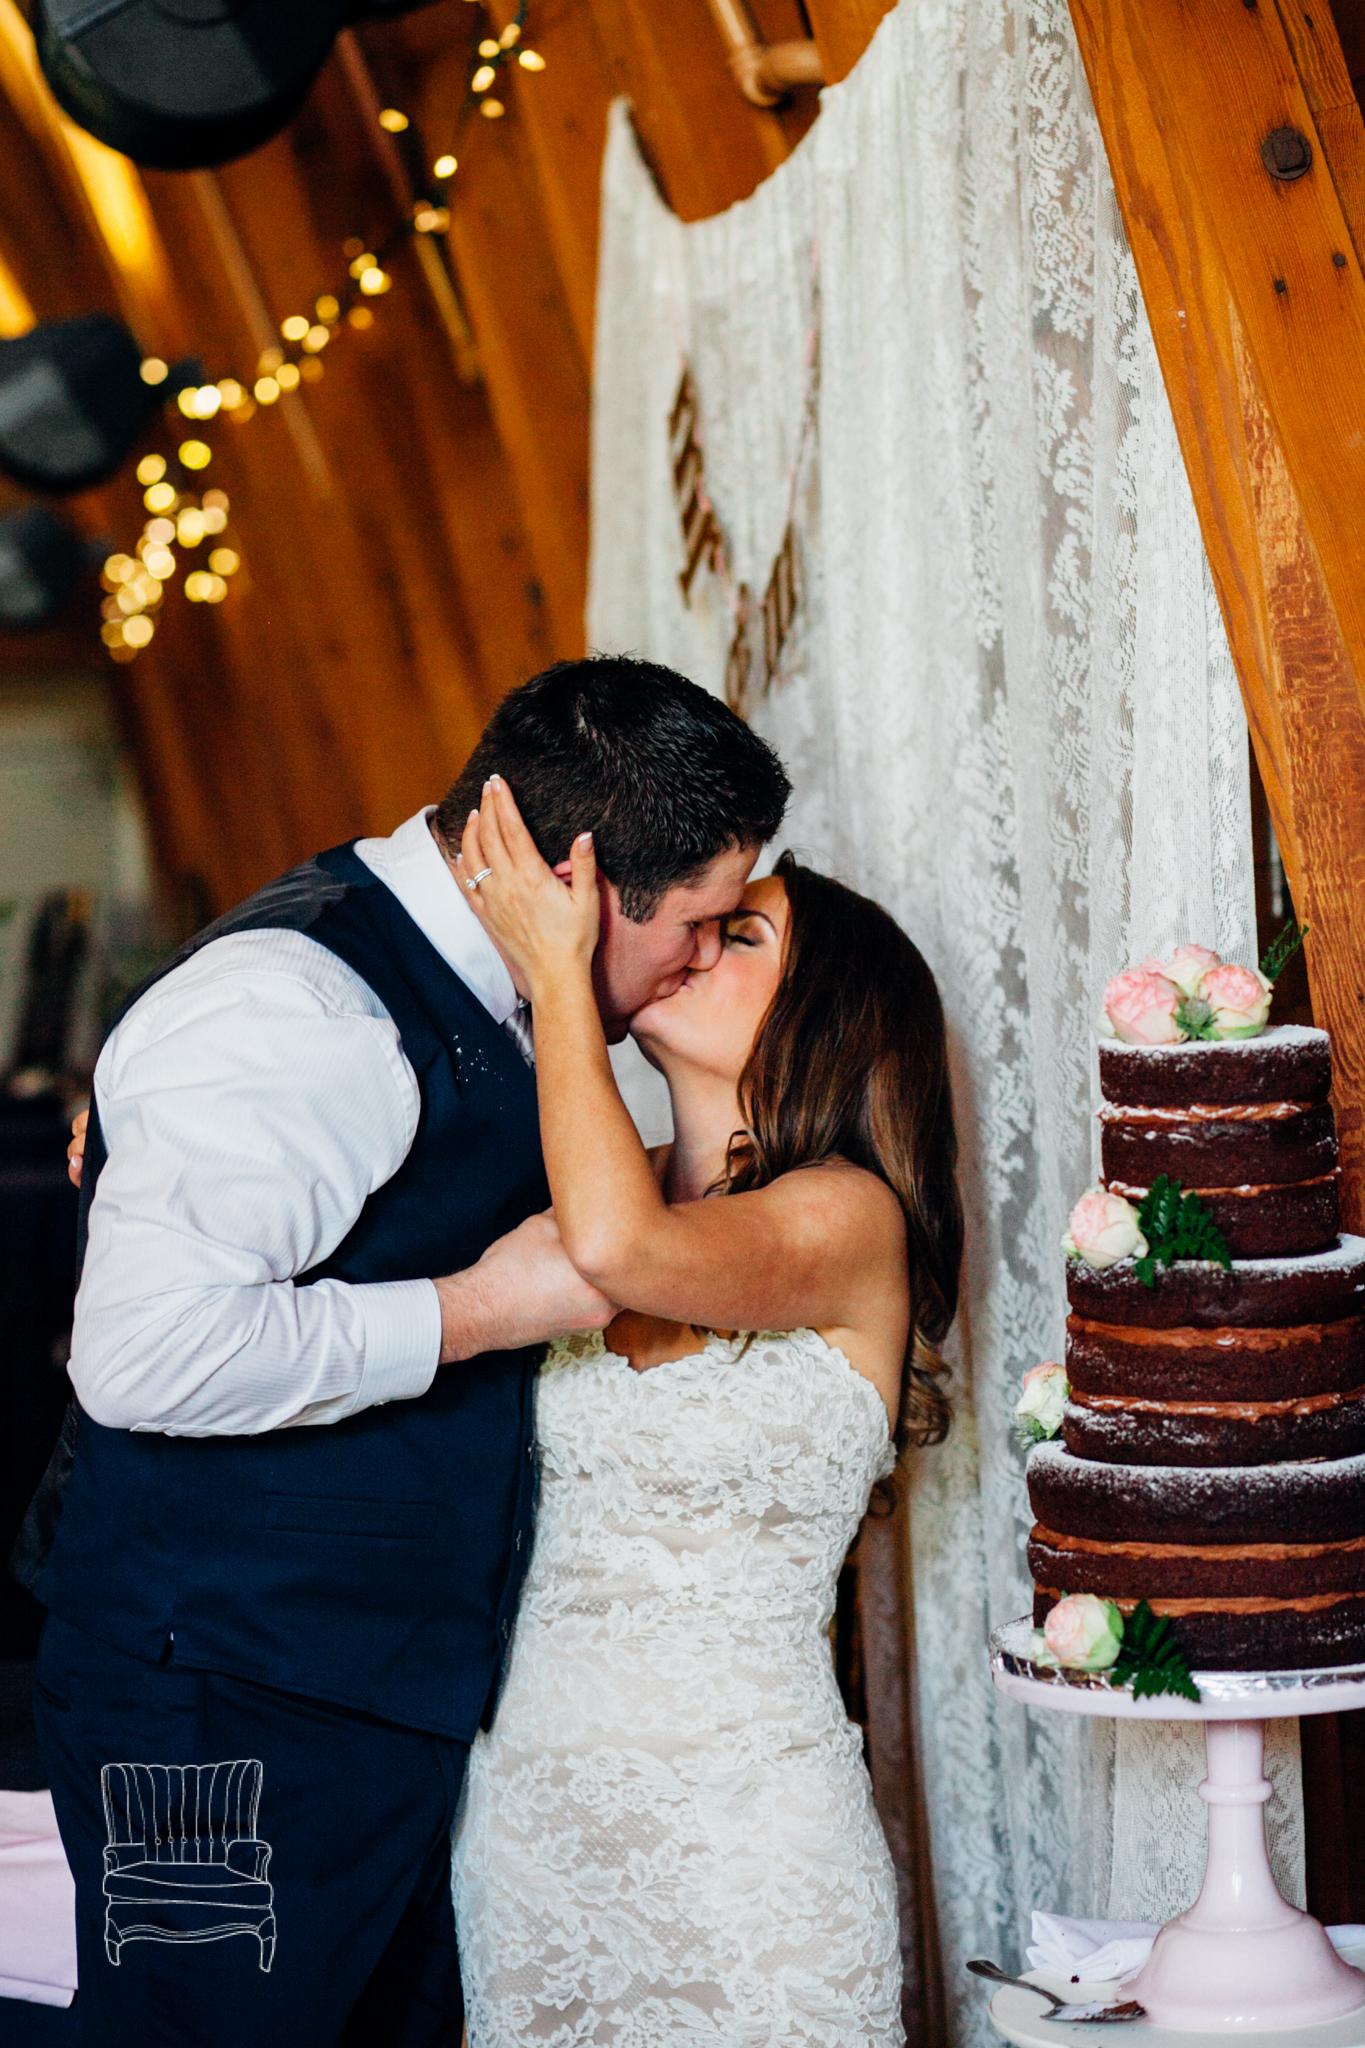 seattle-wedding-photographer-katheryn-moran-russells-bothell-wilkins-wedding-photo-62.jpg